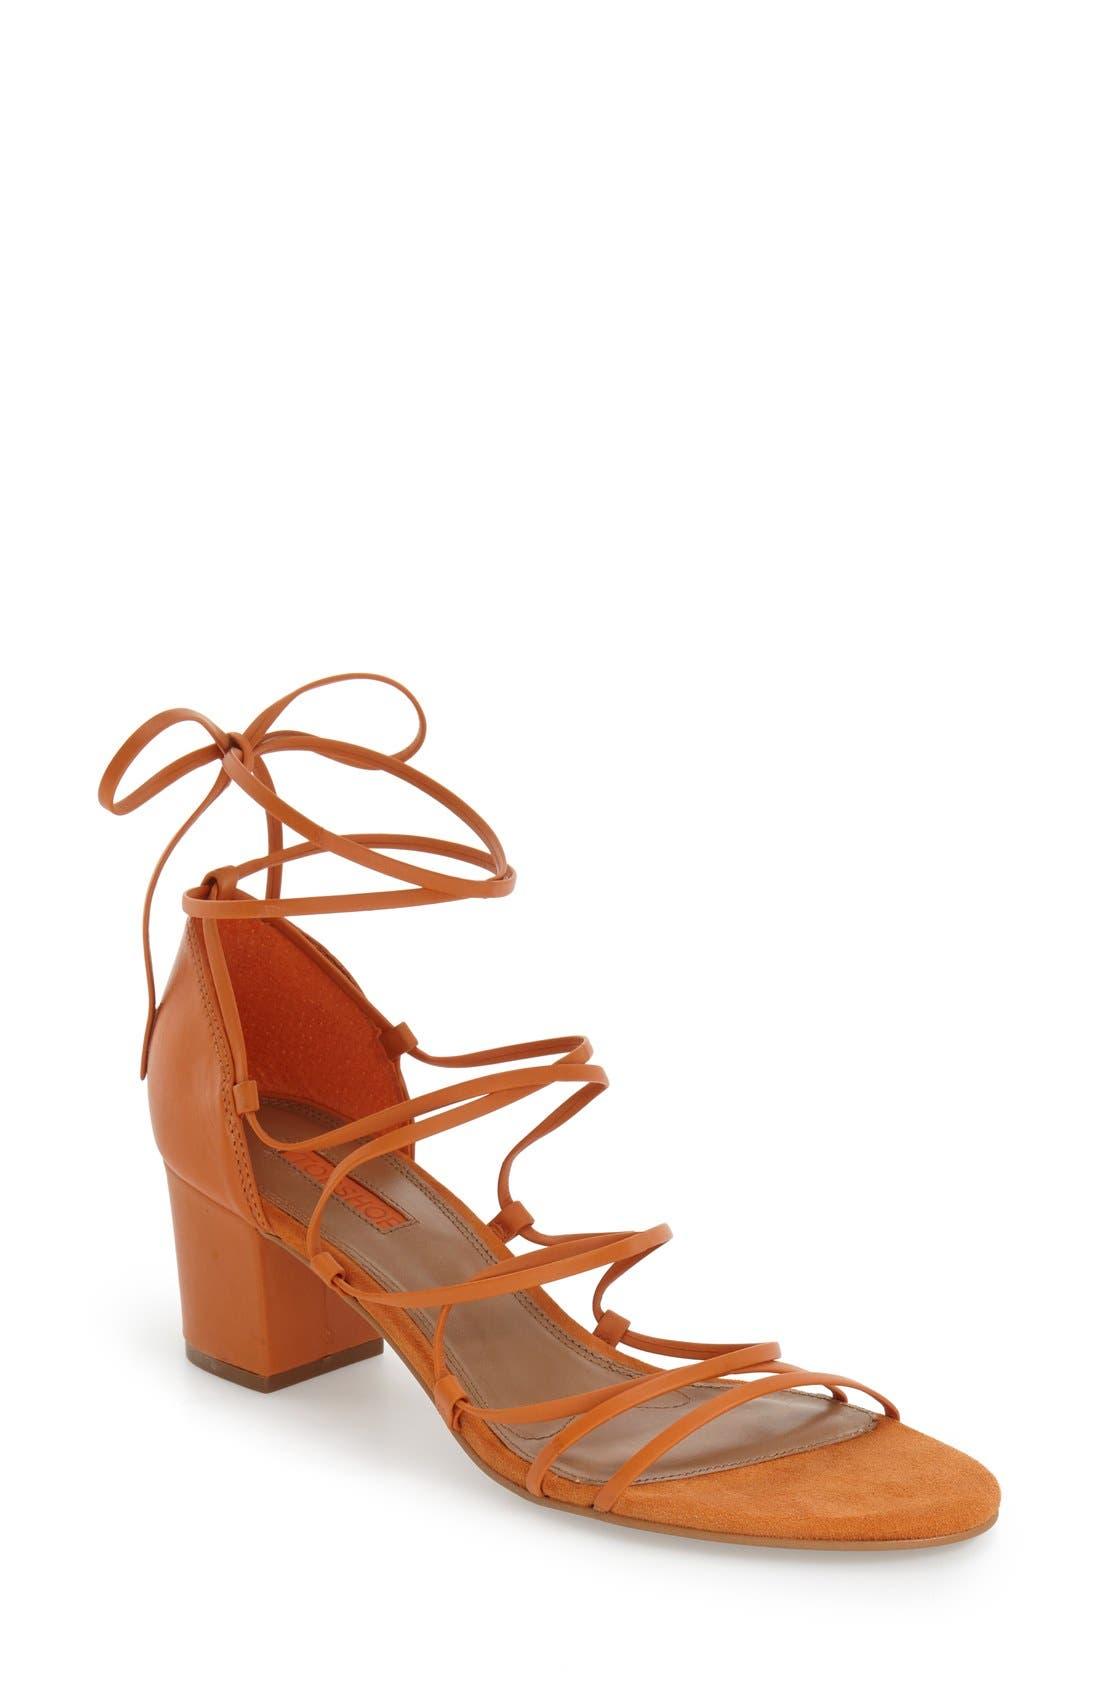 Main Image - Topshop Strappy Block Heel Sandal (Women)